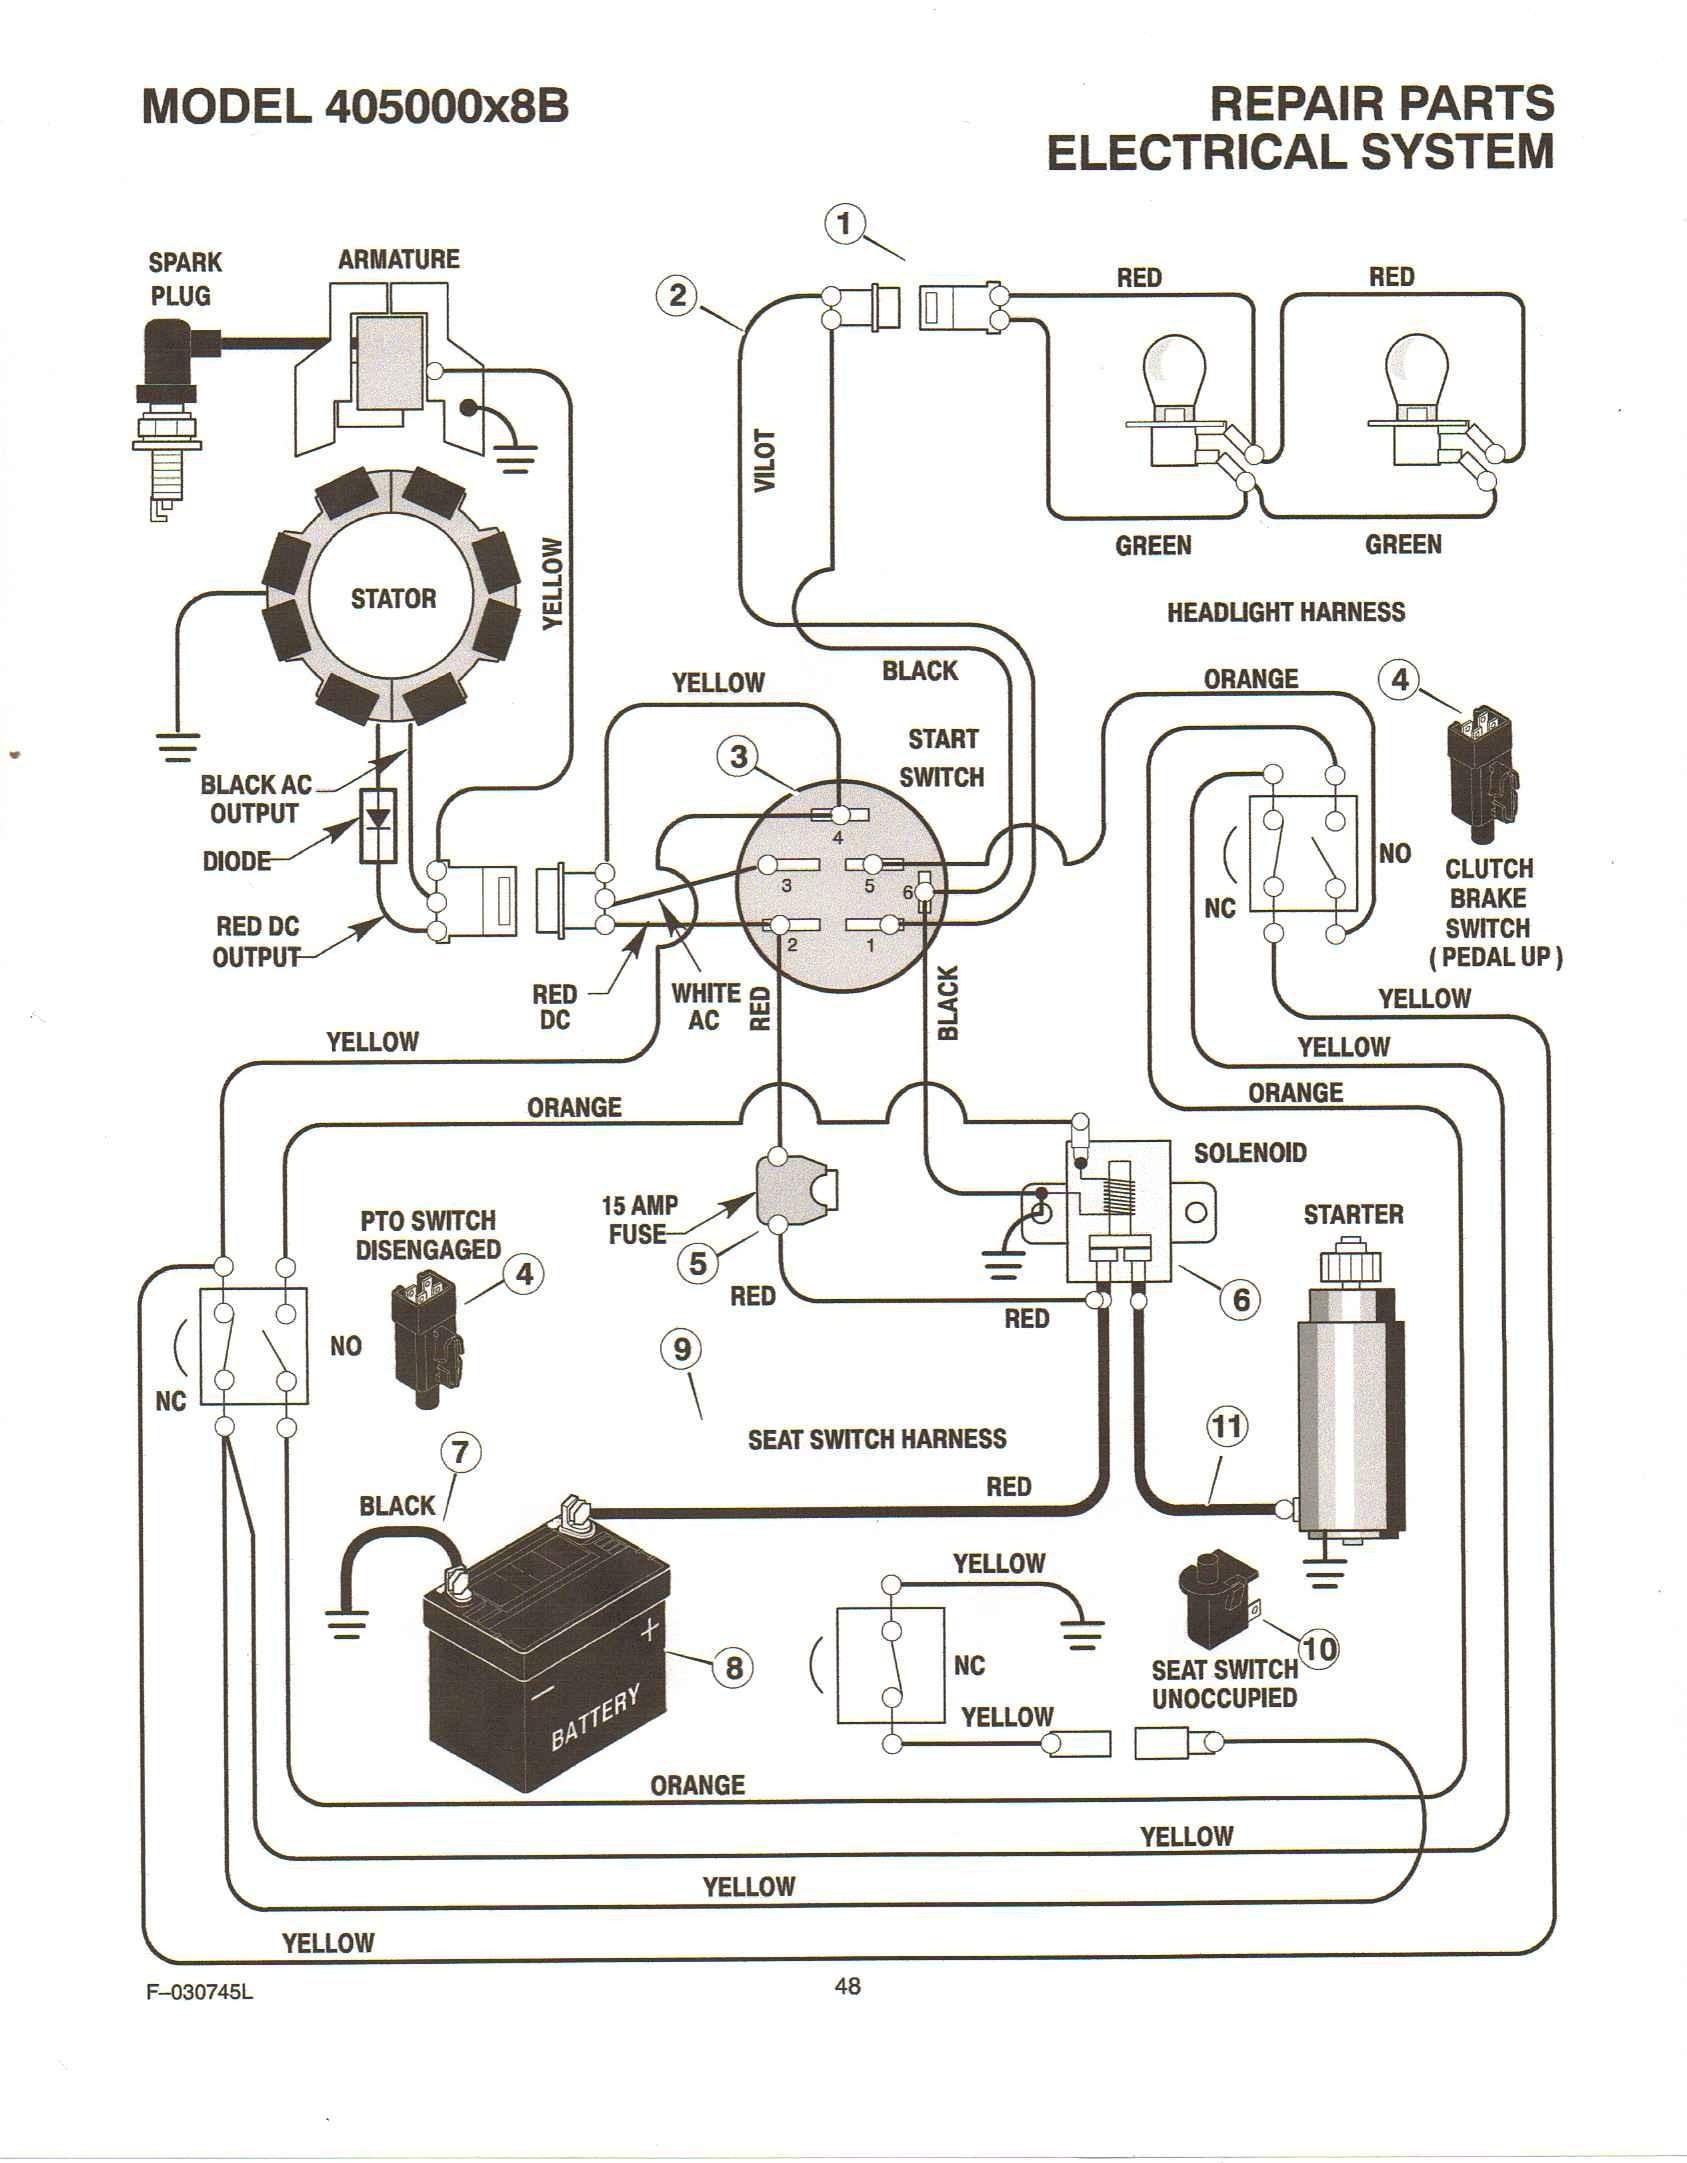 Kohler Engine Wiring Diagram Kohler Ignition Switch Wiring Diagram Best Wiring Diagram for Kohler